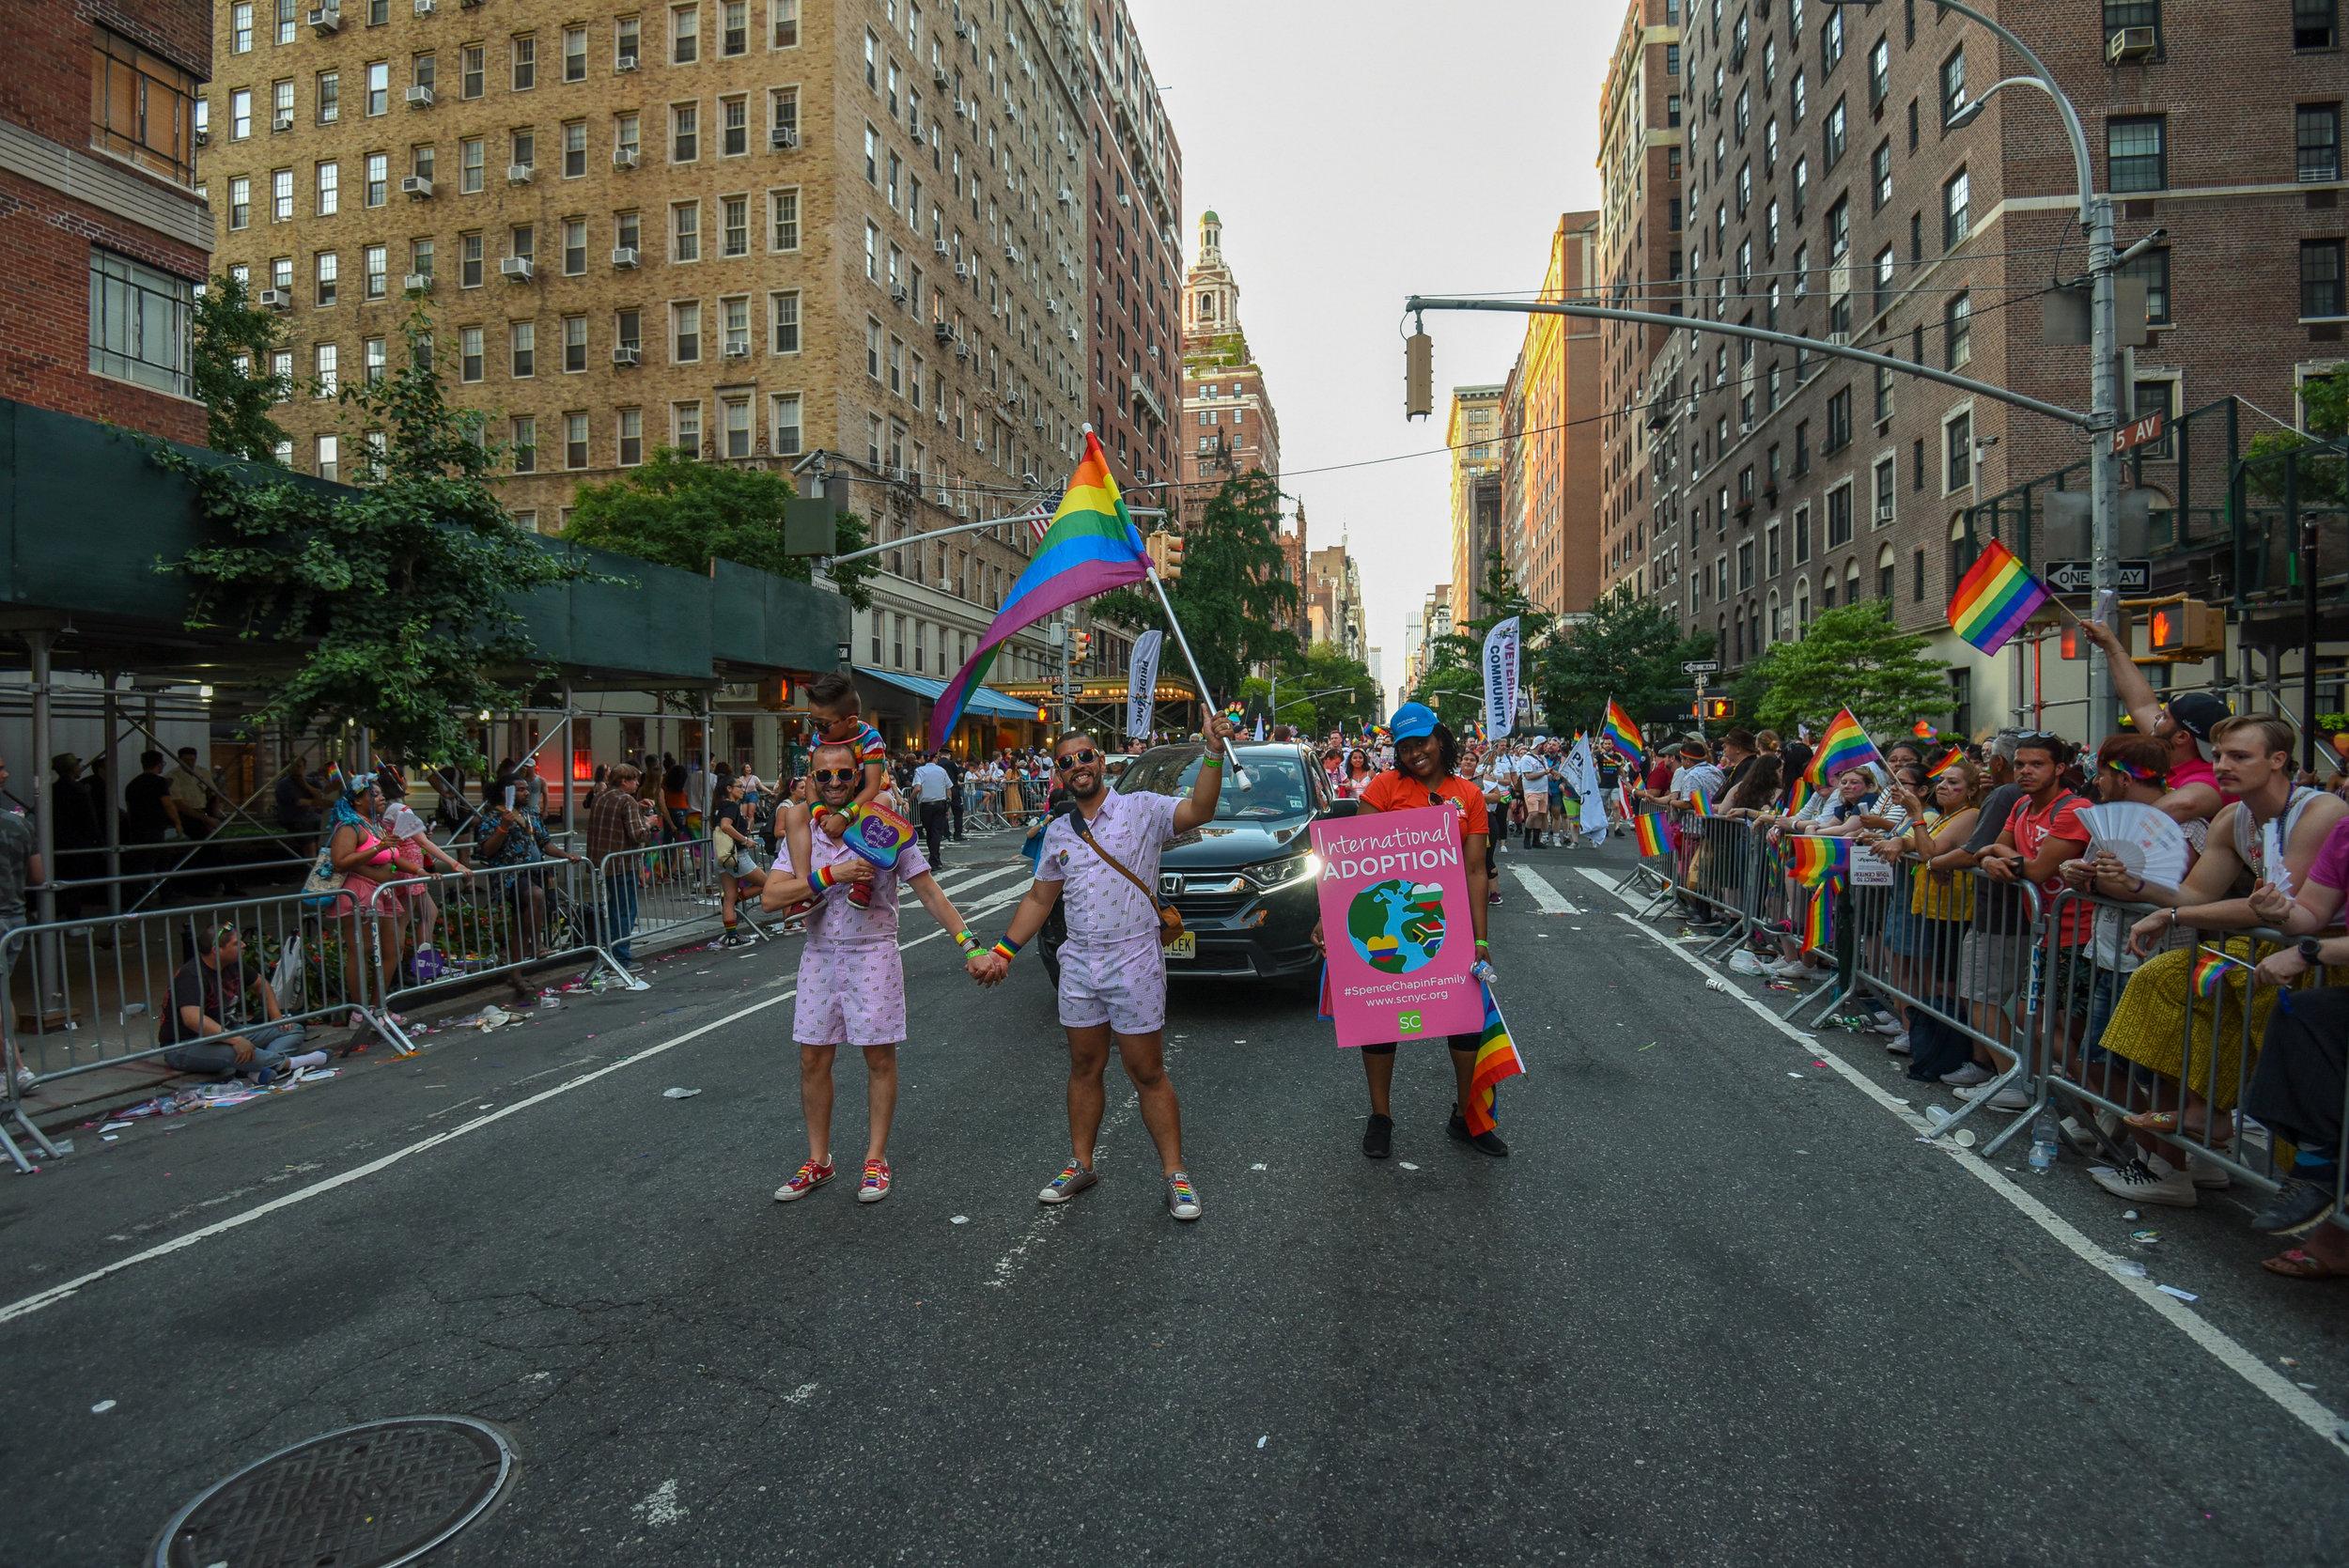 SC-PrideParade-2019_FE-337.jpg